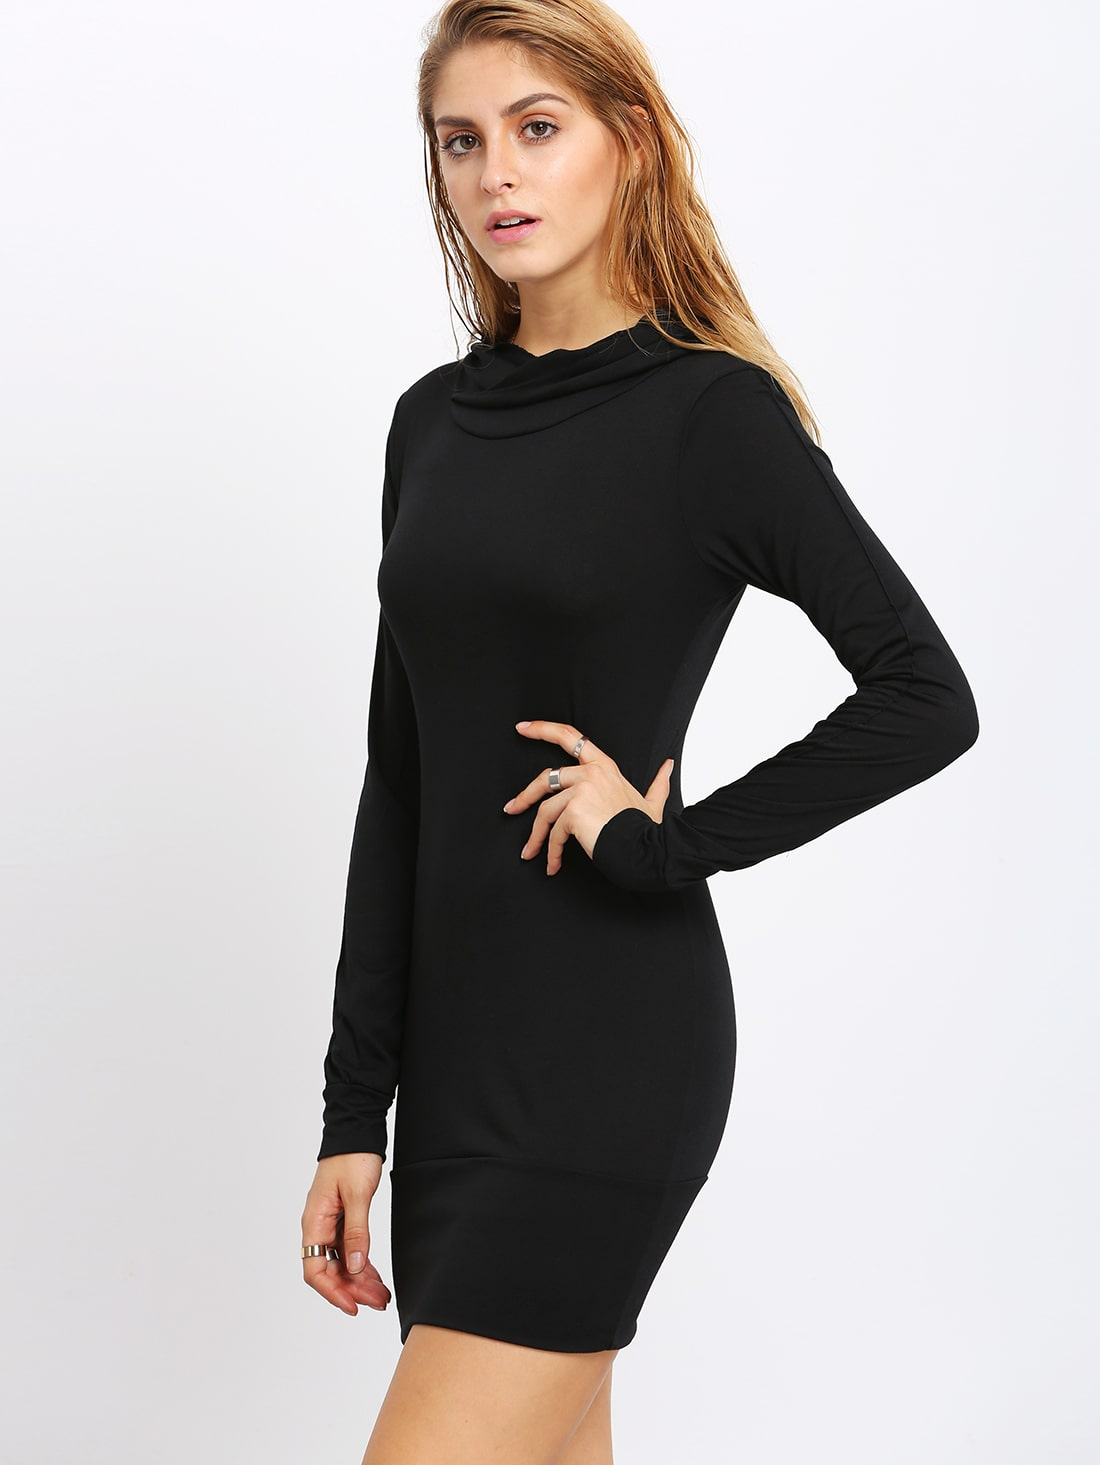 Black long sleeve bodycon dress x men